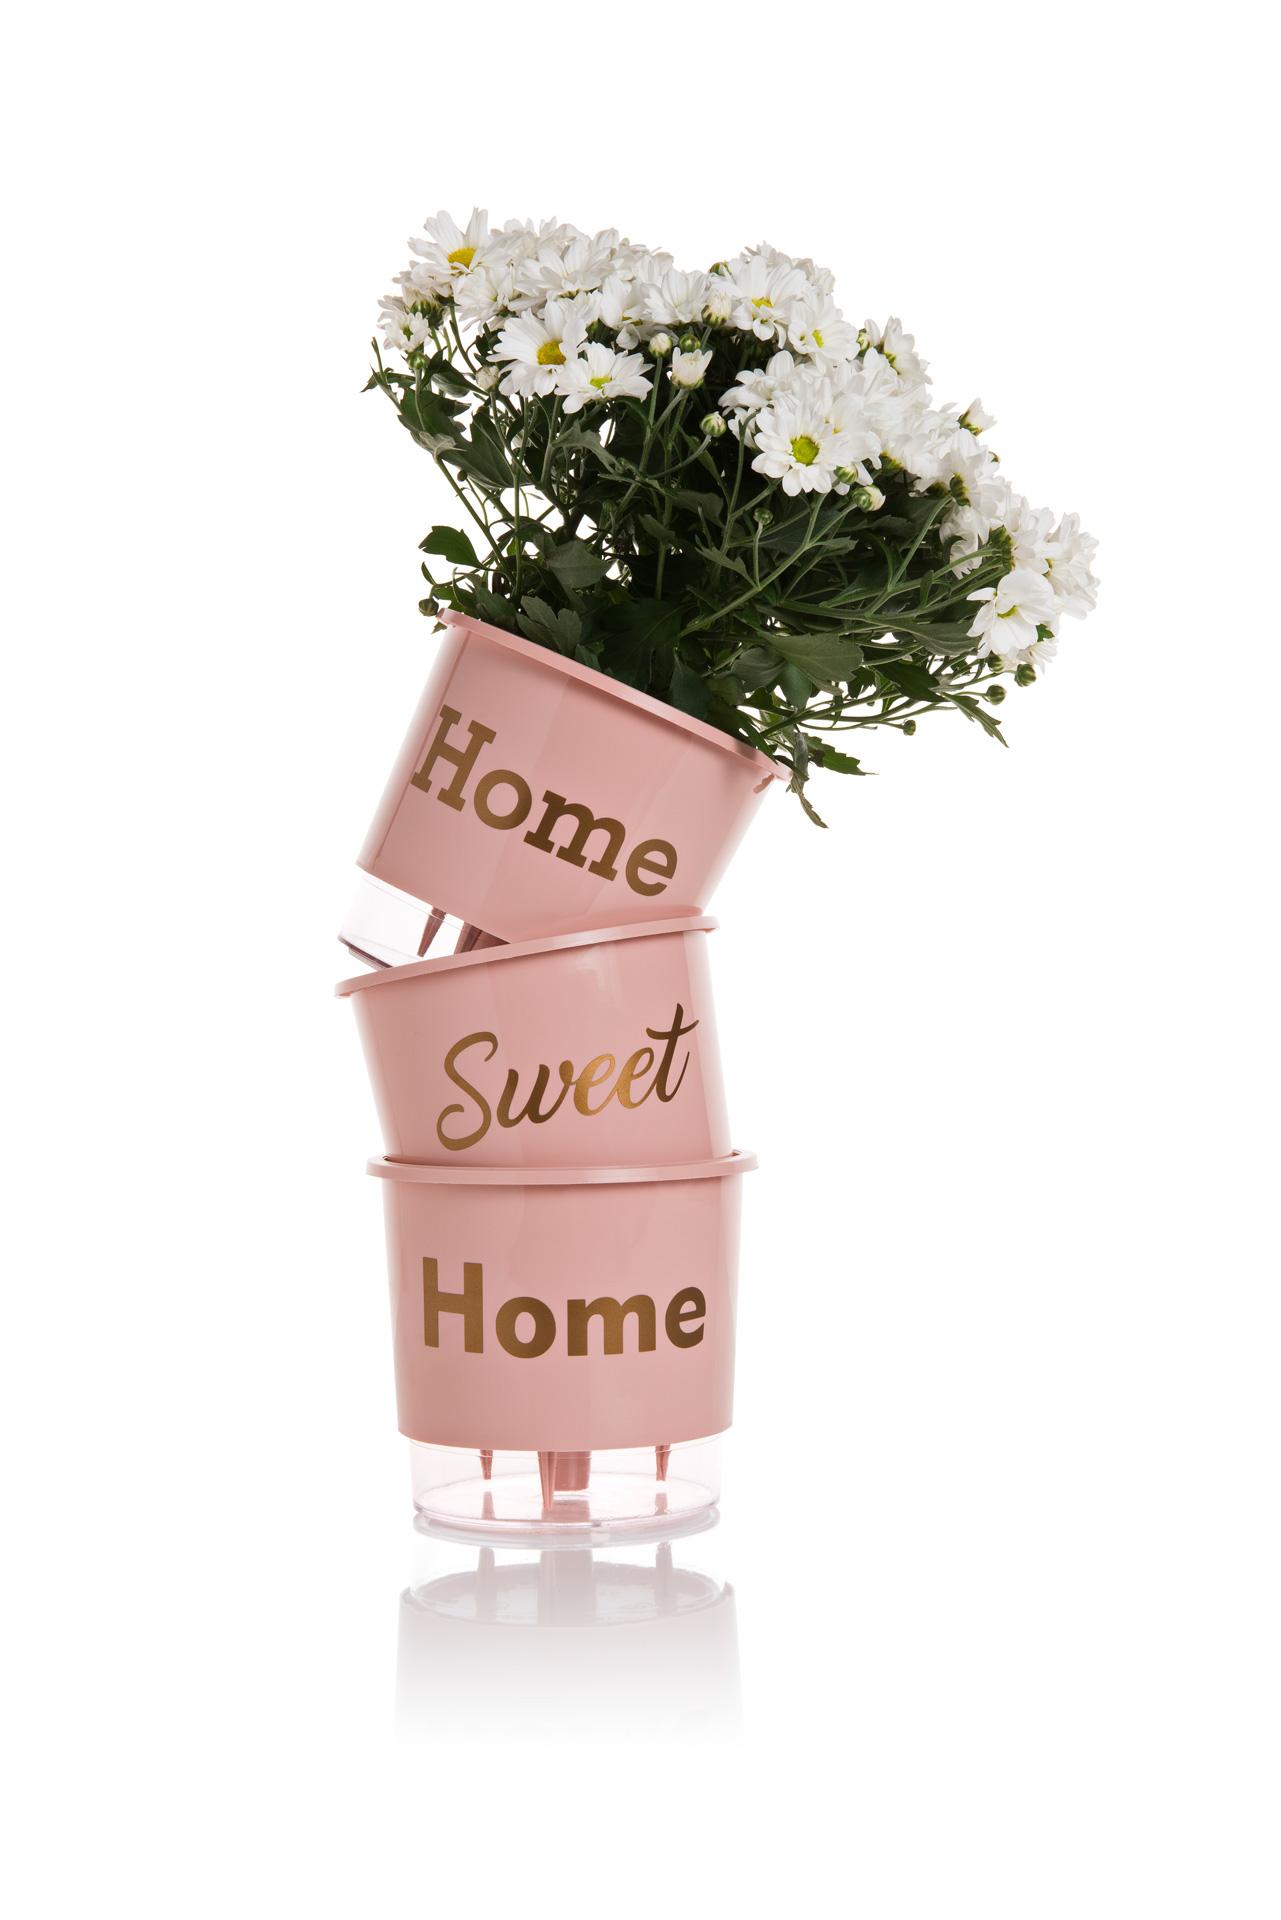 Conjunto 3 Vasos Autoirrigáveis Rosa Quartz Pequenos 12cm x 11cm Home Sweet Home  - Loja Raiz